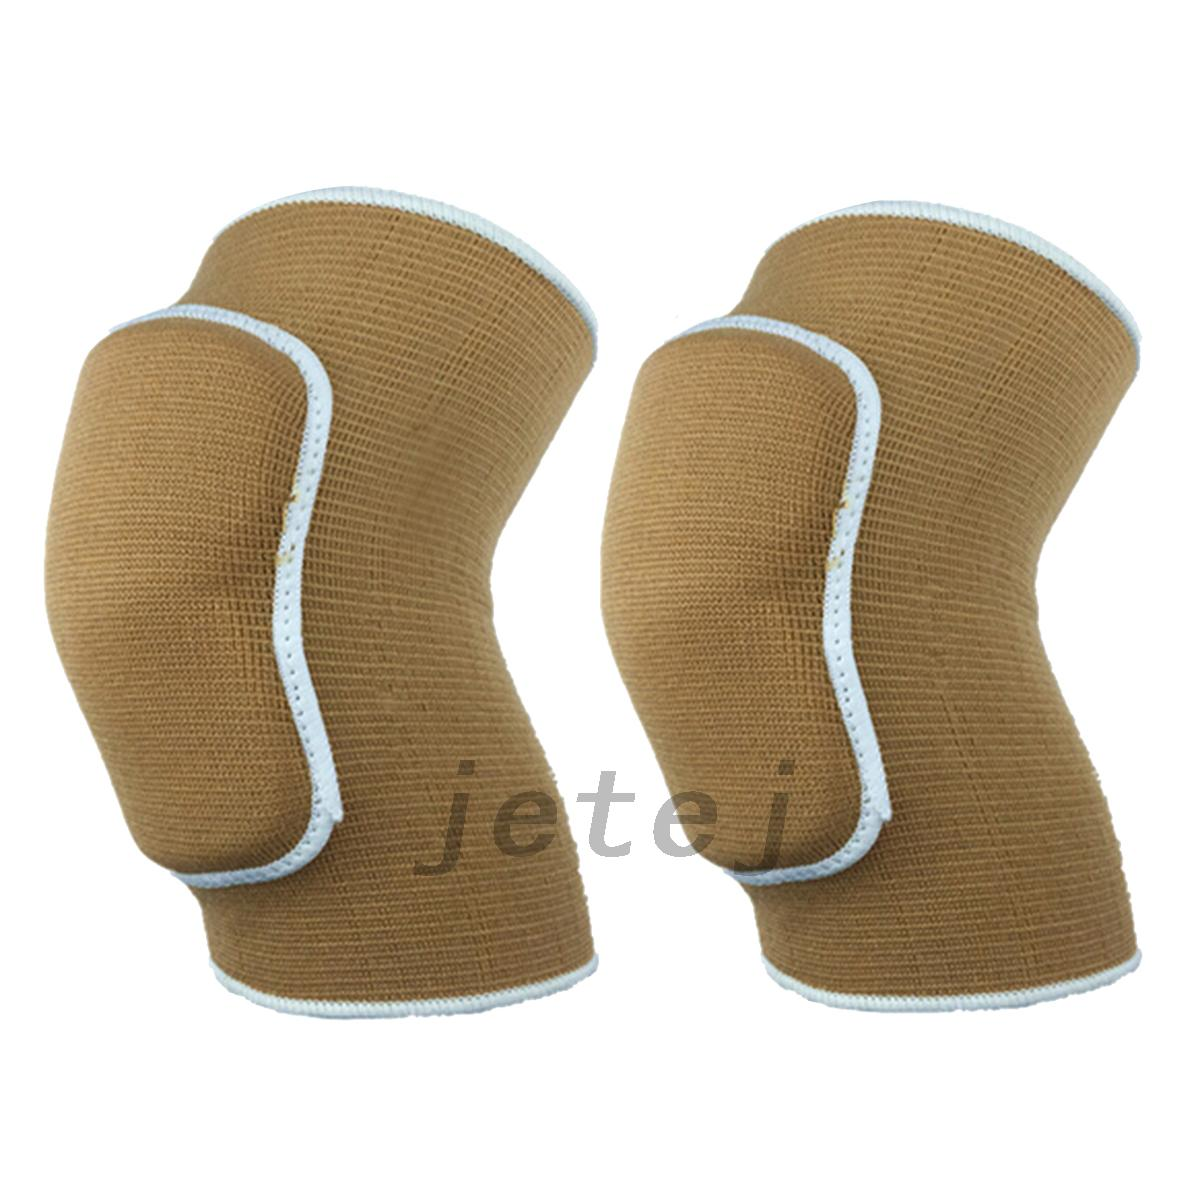 volleyball handball kniesch tzer knieschoner knieschutz knie schoner f r kinder ebay